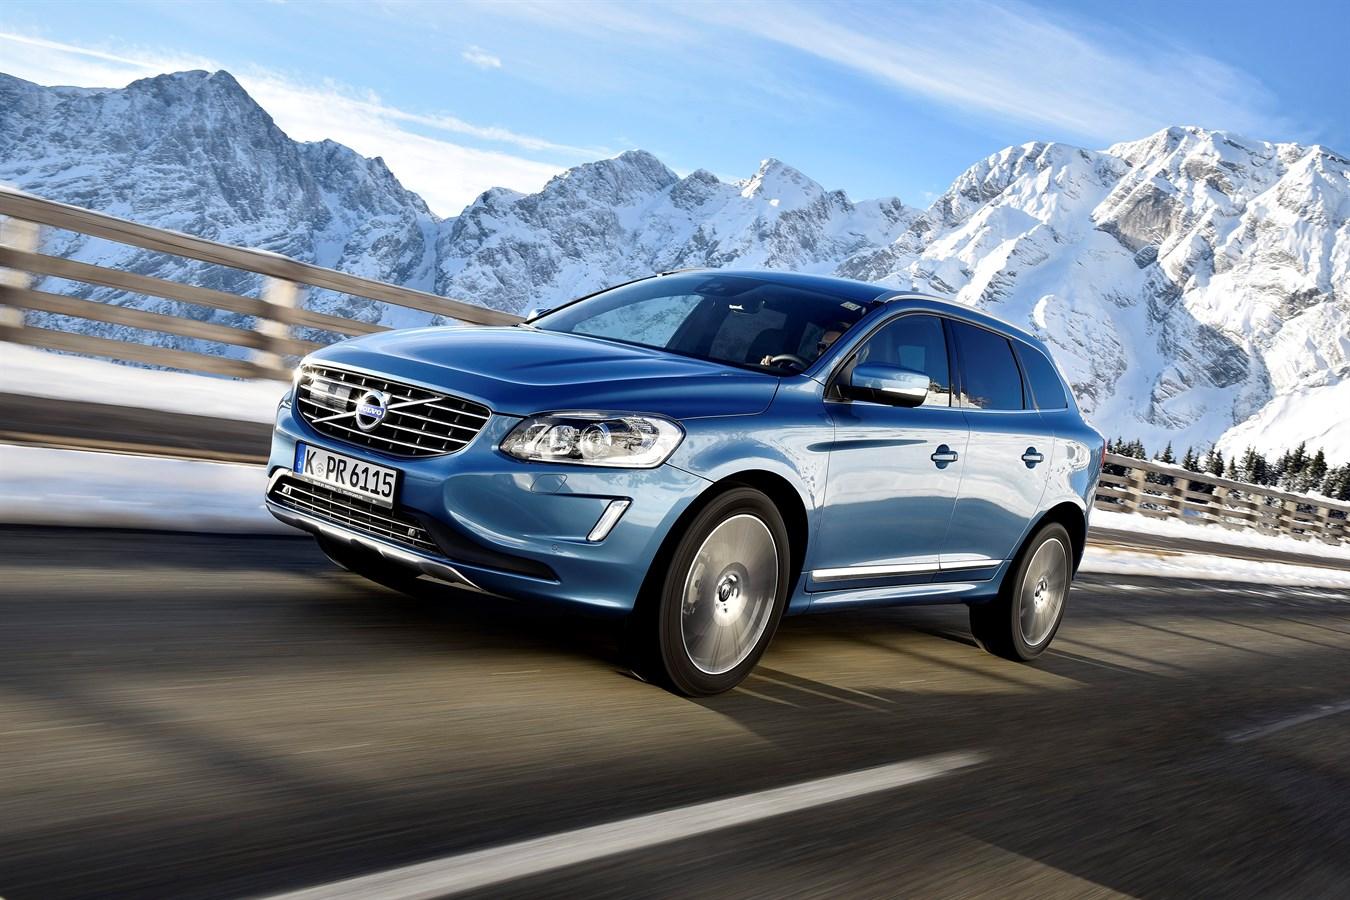 Volvo XC60 - model year 2017